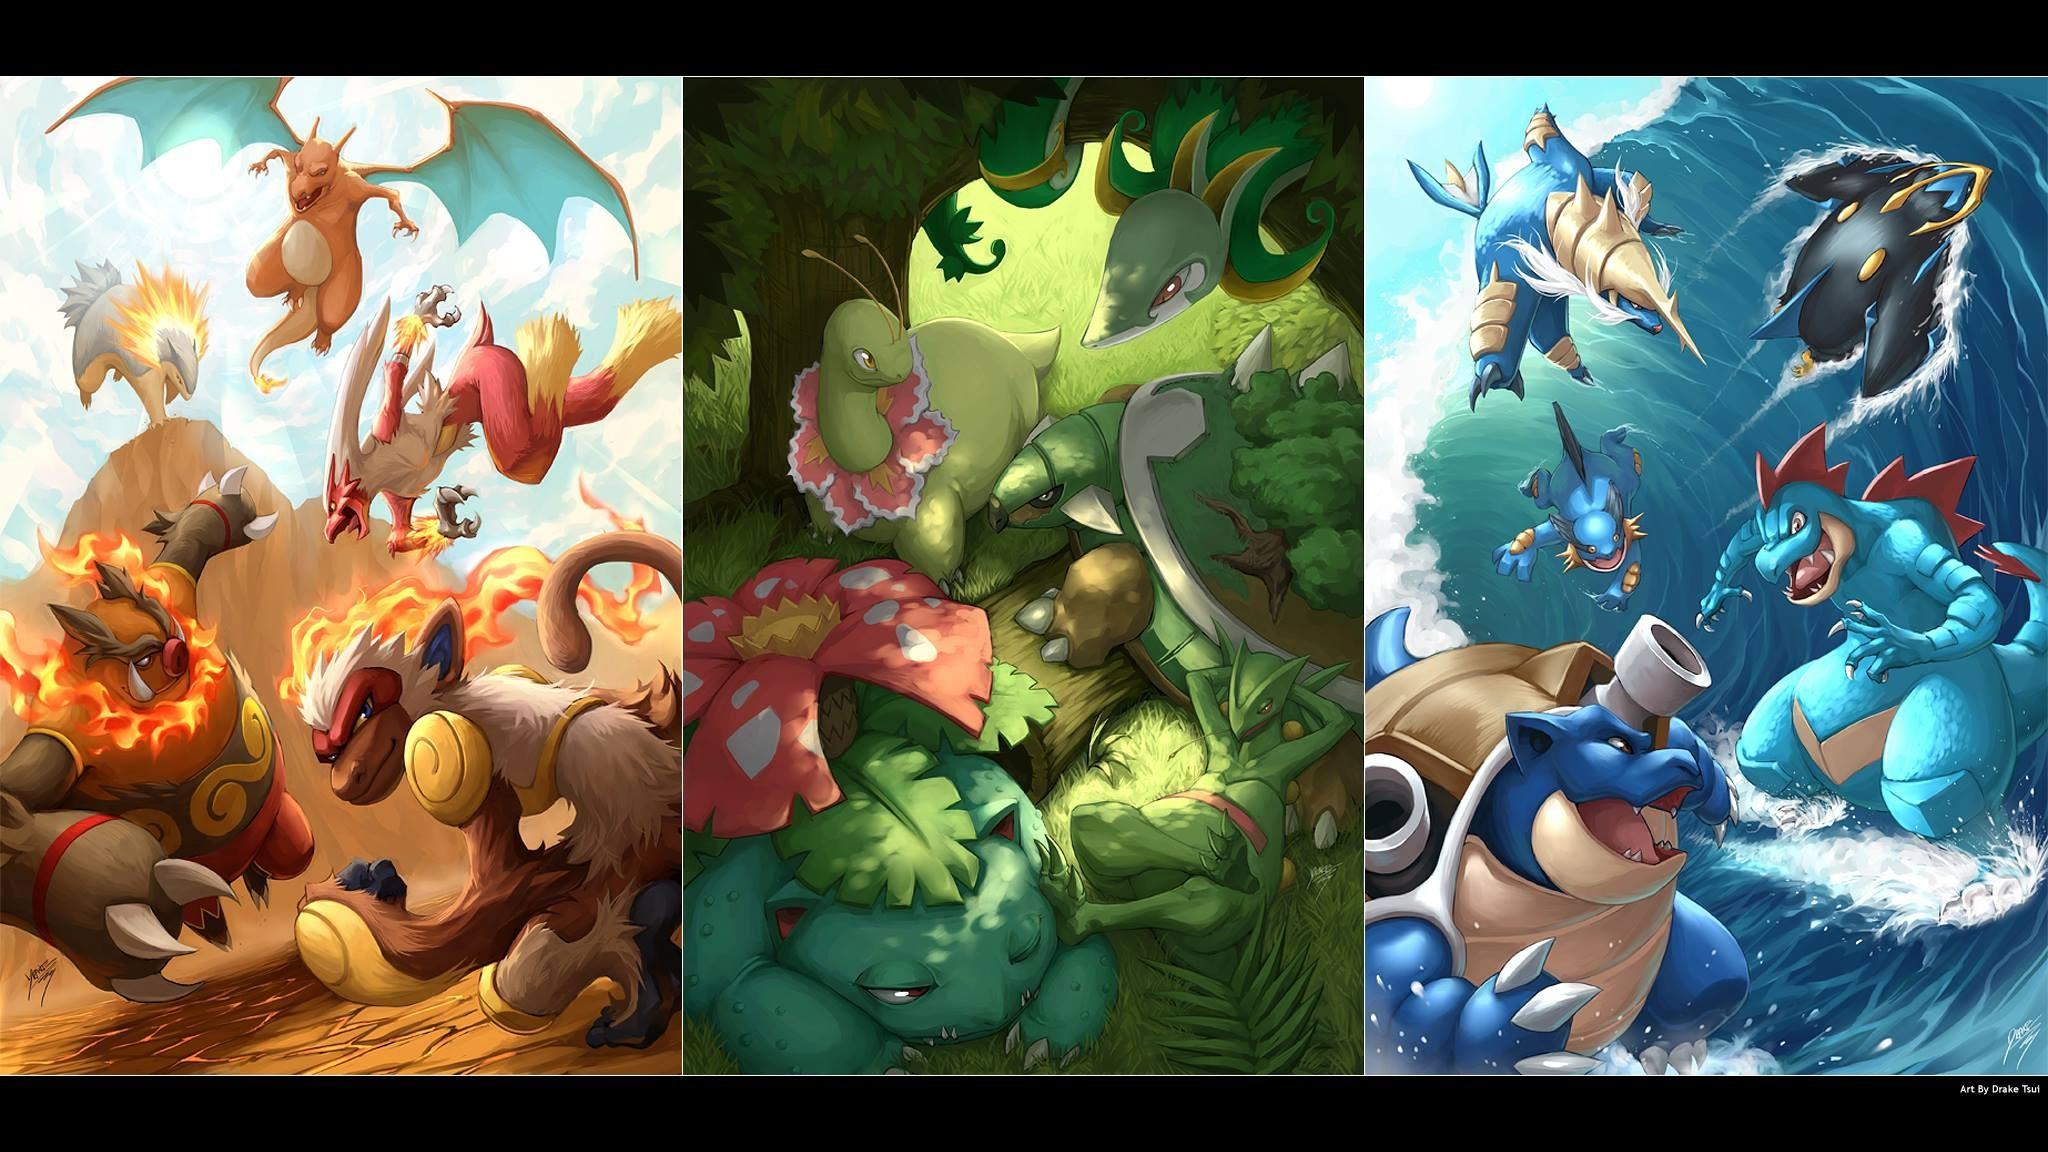 Wallpaper Illustration Anime Collage Pok Mon Pokemon